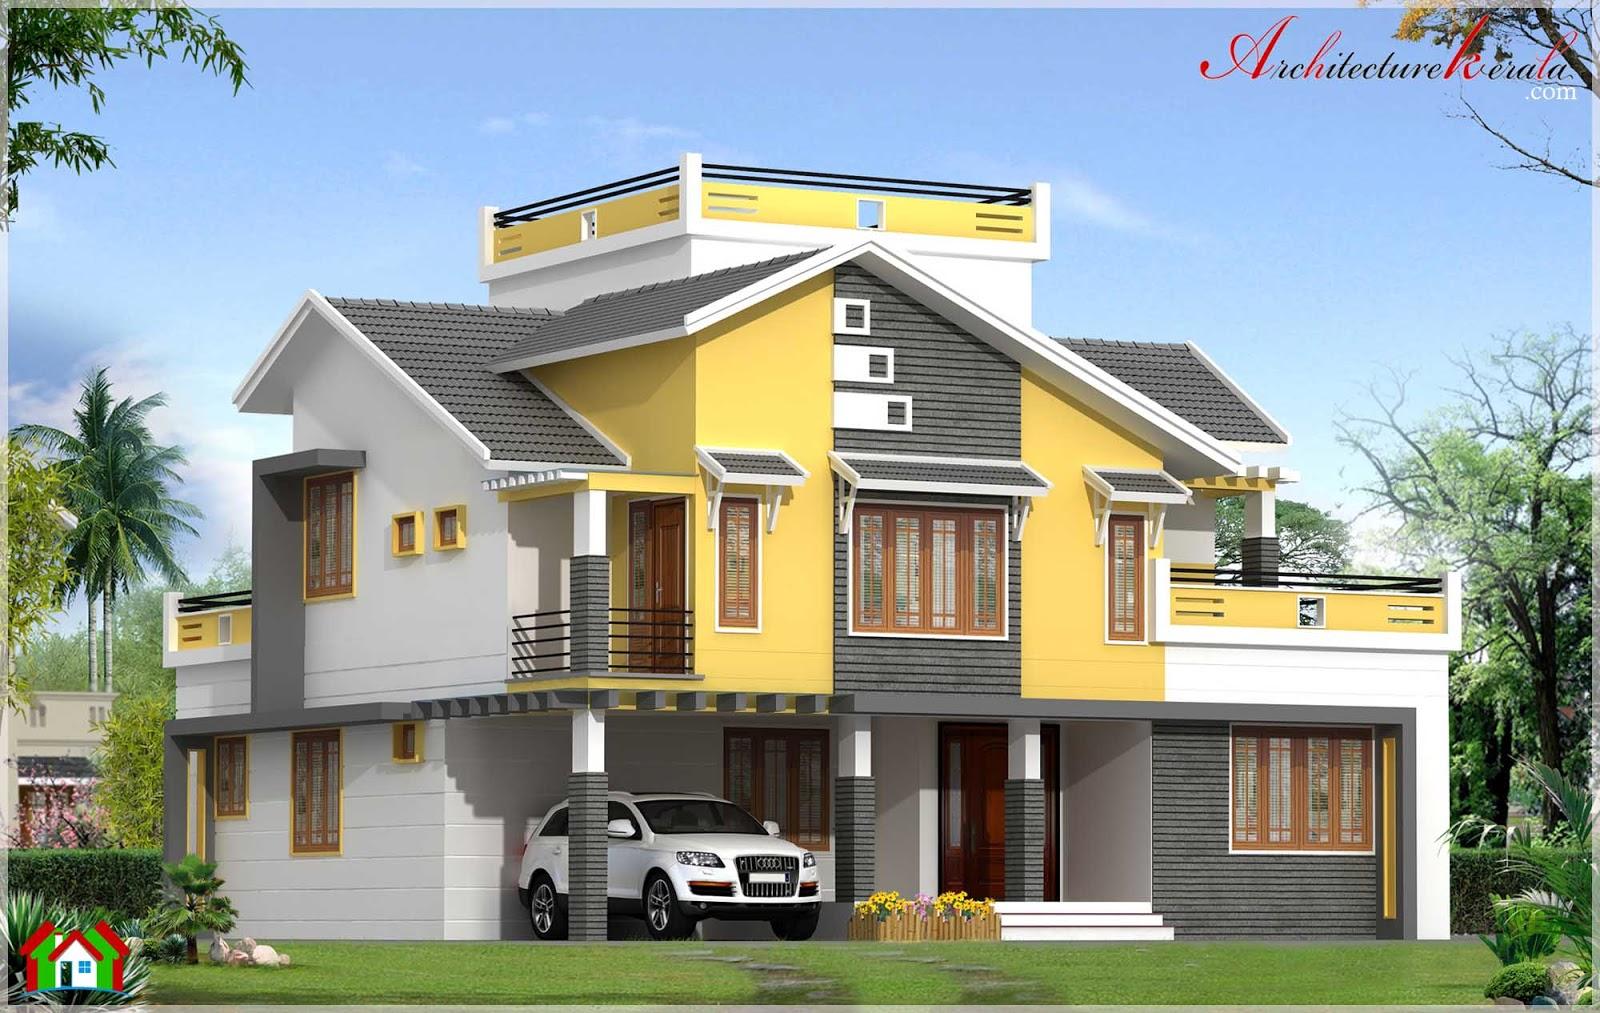 http://2.bp.blogspot.com/-o9PSZw_ANxs/UQC1FLXGcUI/AAAAAAAAANA/DitiNW8oY8w/s1600/architectural%20kerala%20148.JPG